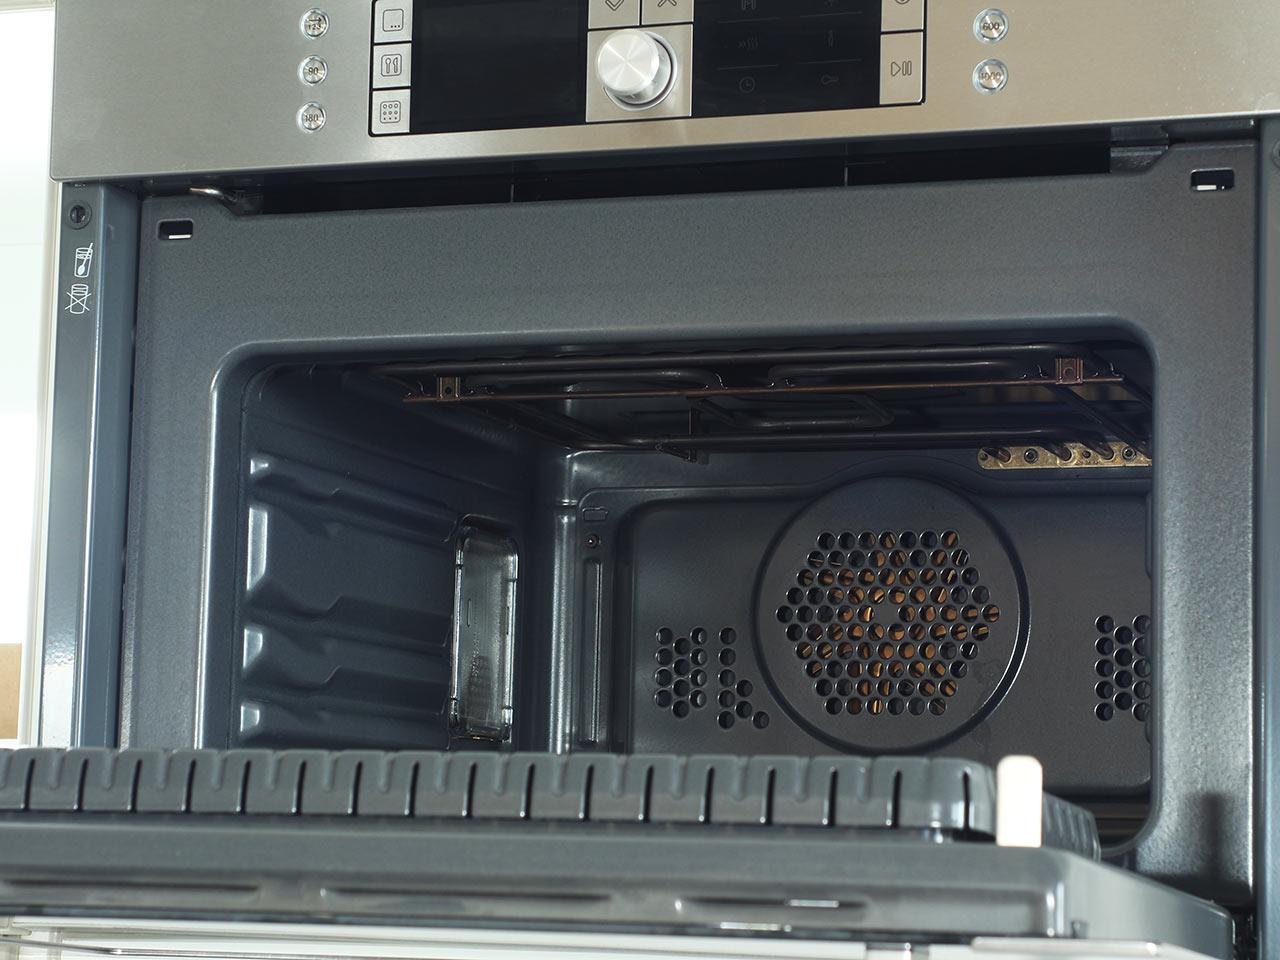 bosch hbc86p753 einbau kompakt backofen inkl mikrowelle. Black Bedroom Furniture Sets. Home Design Ideas